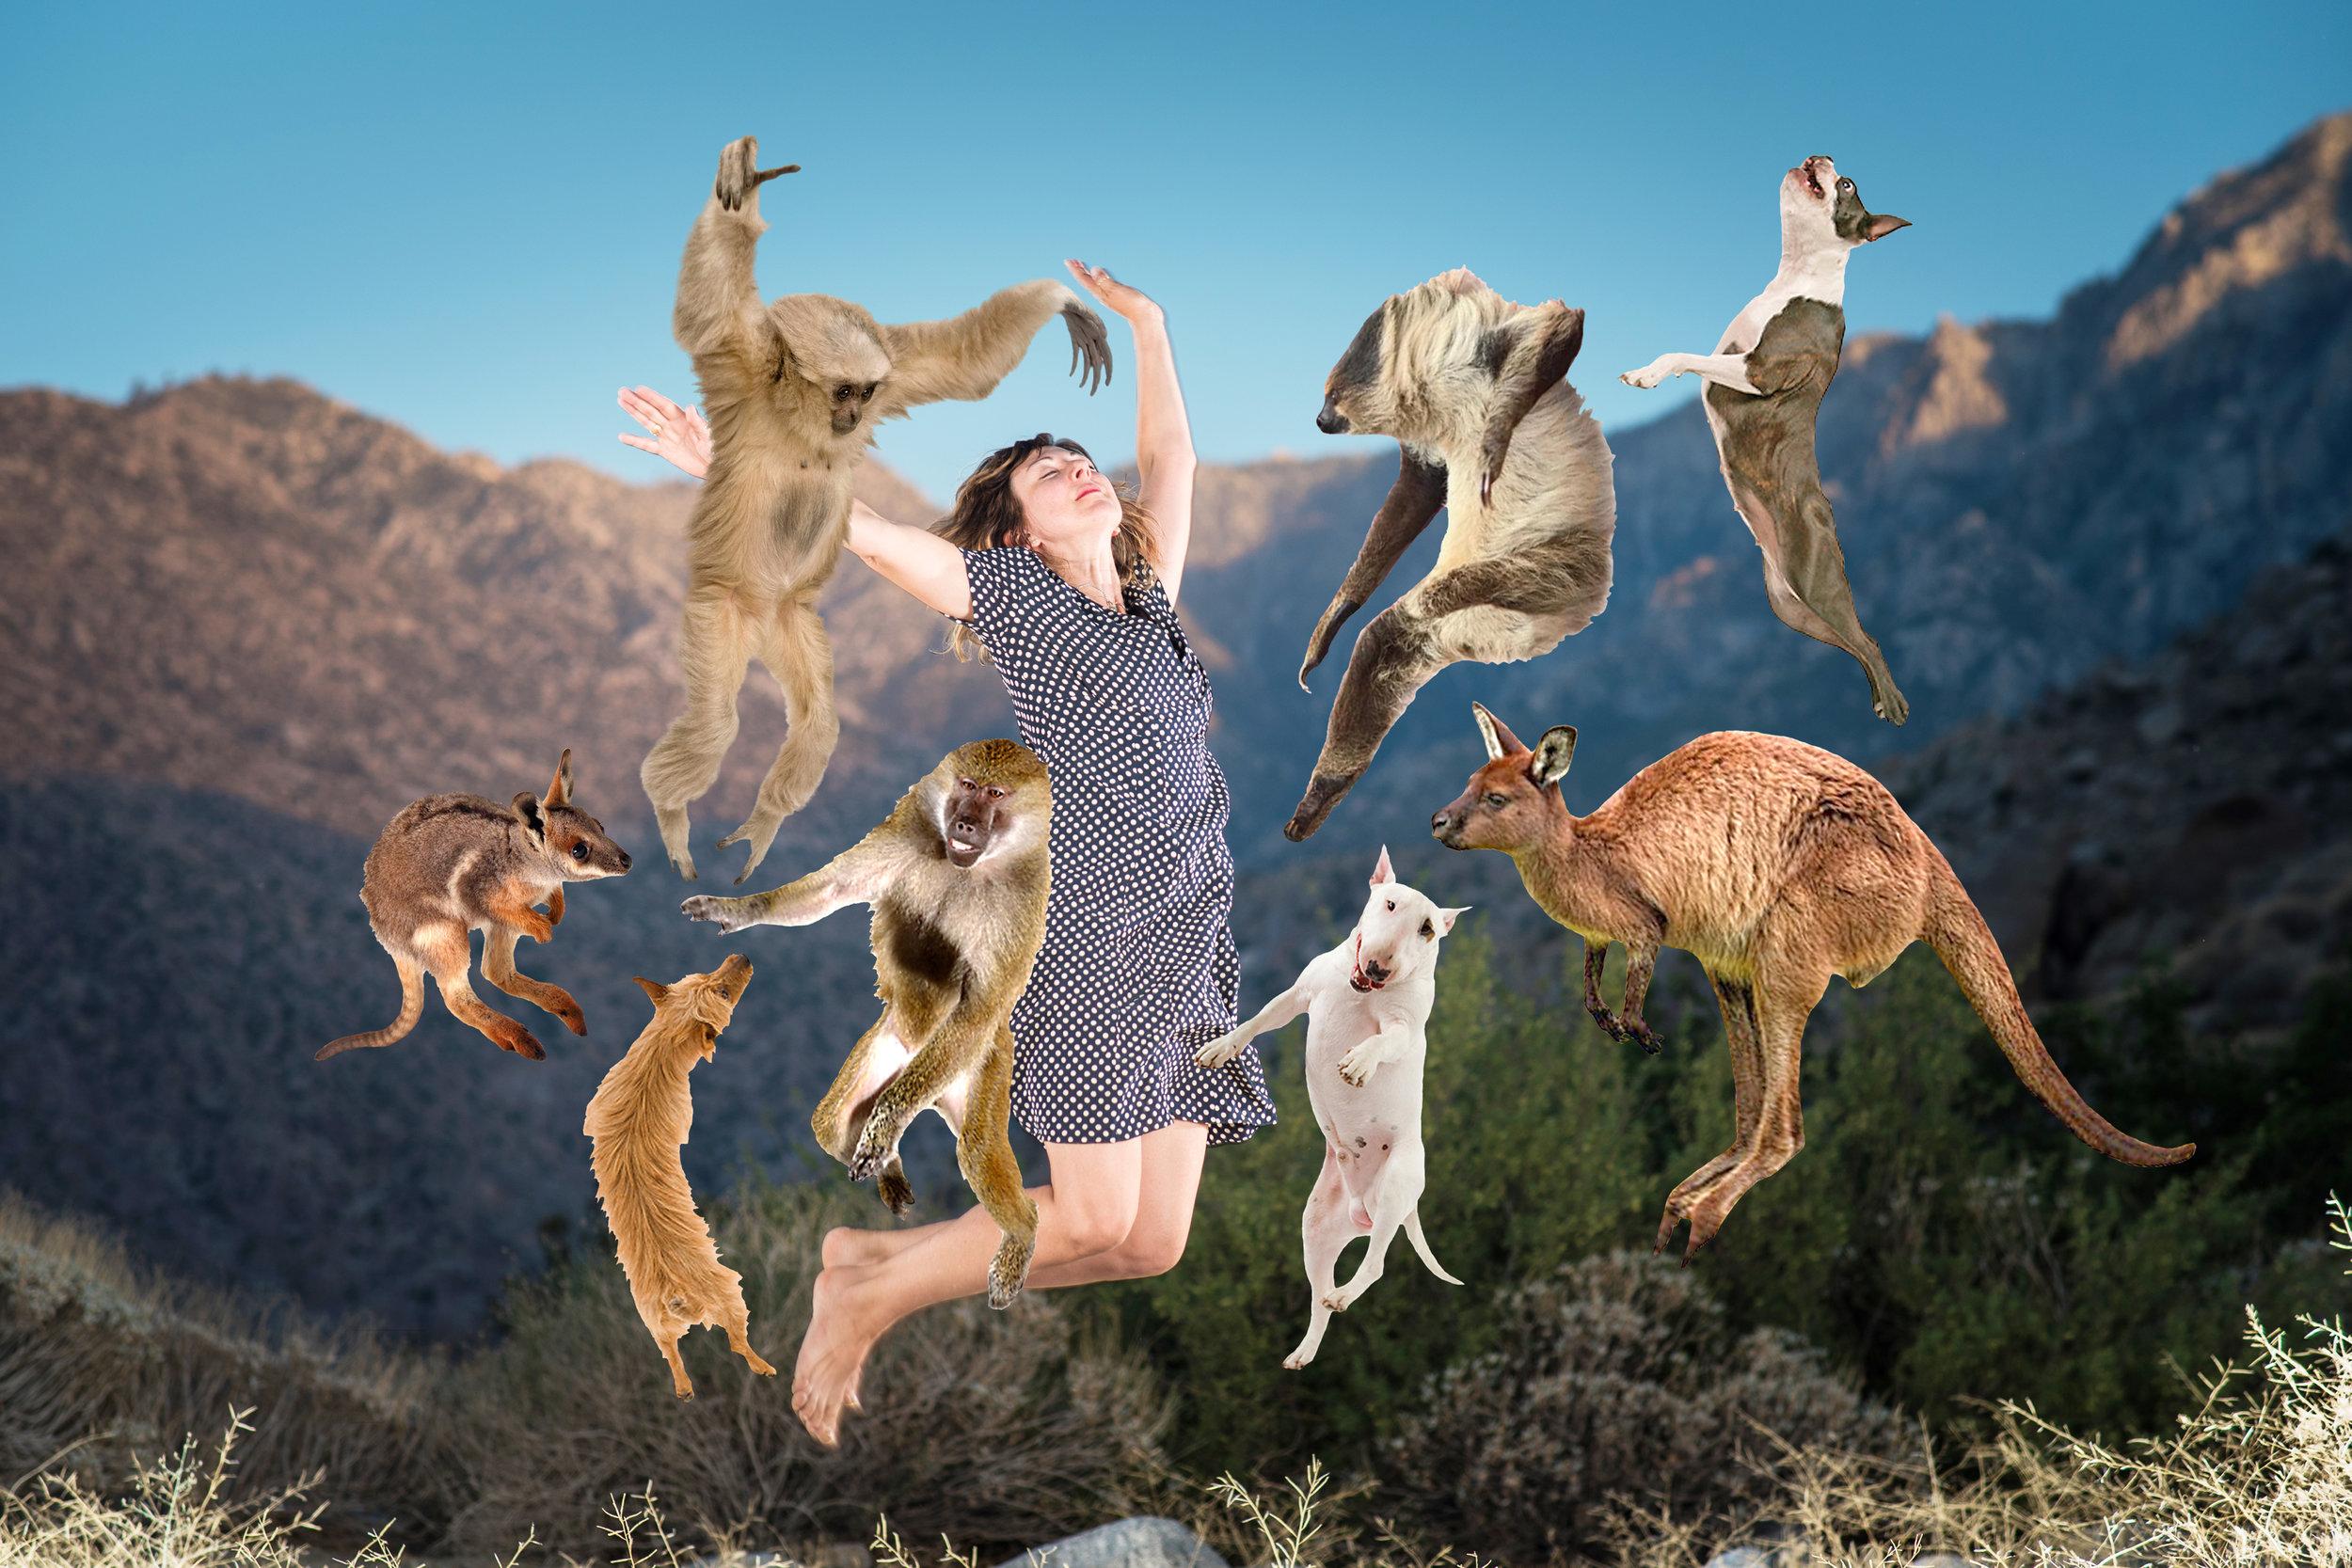 DottyJump with animals2_5676_B.jpg